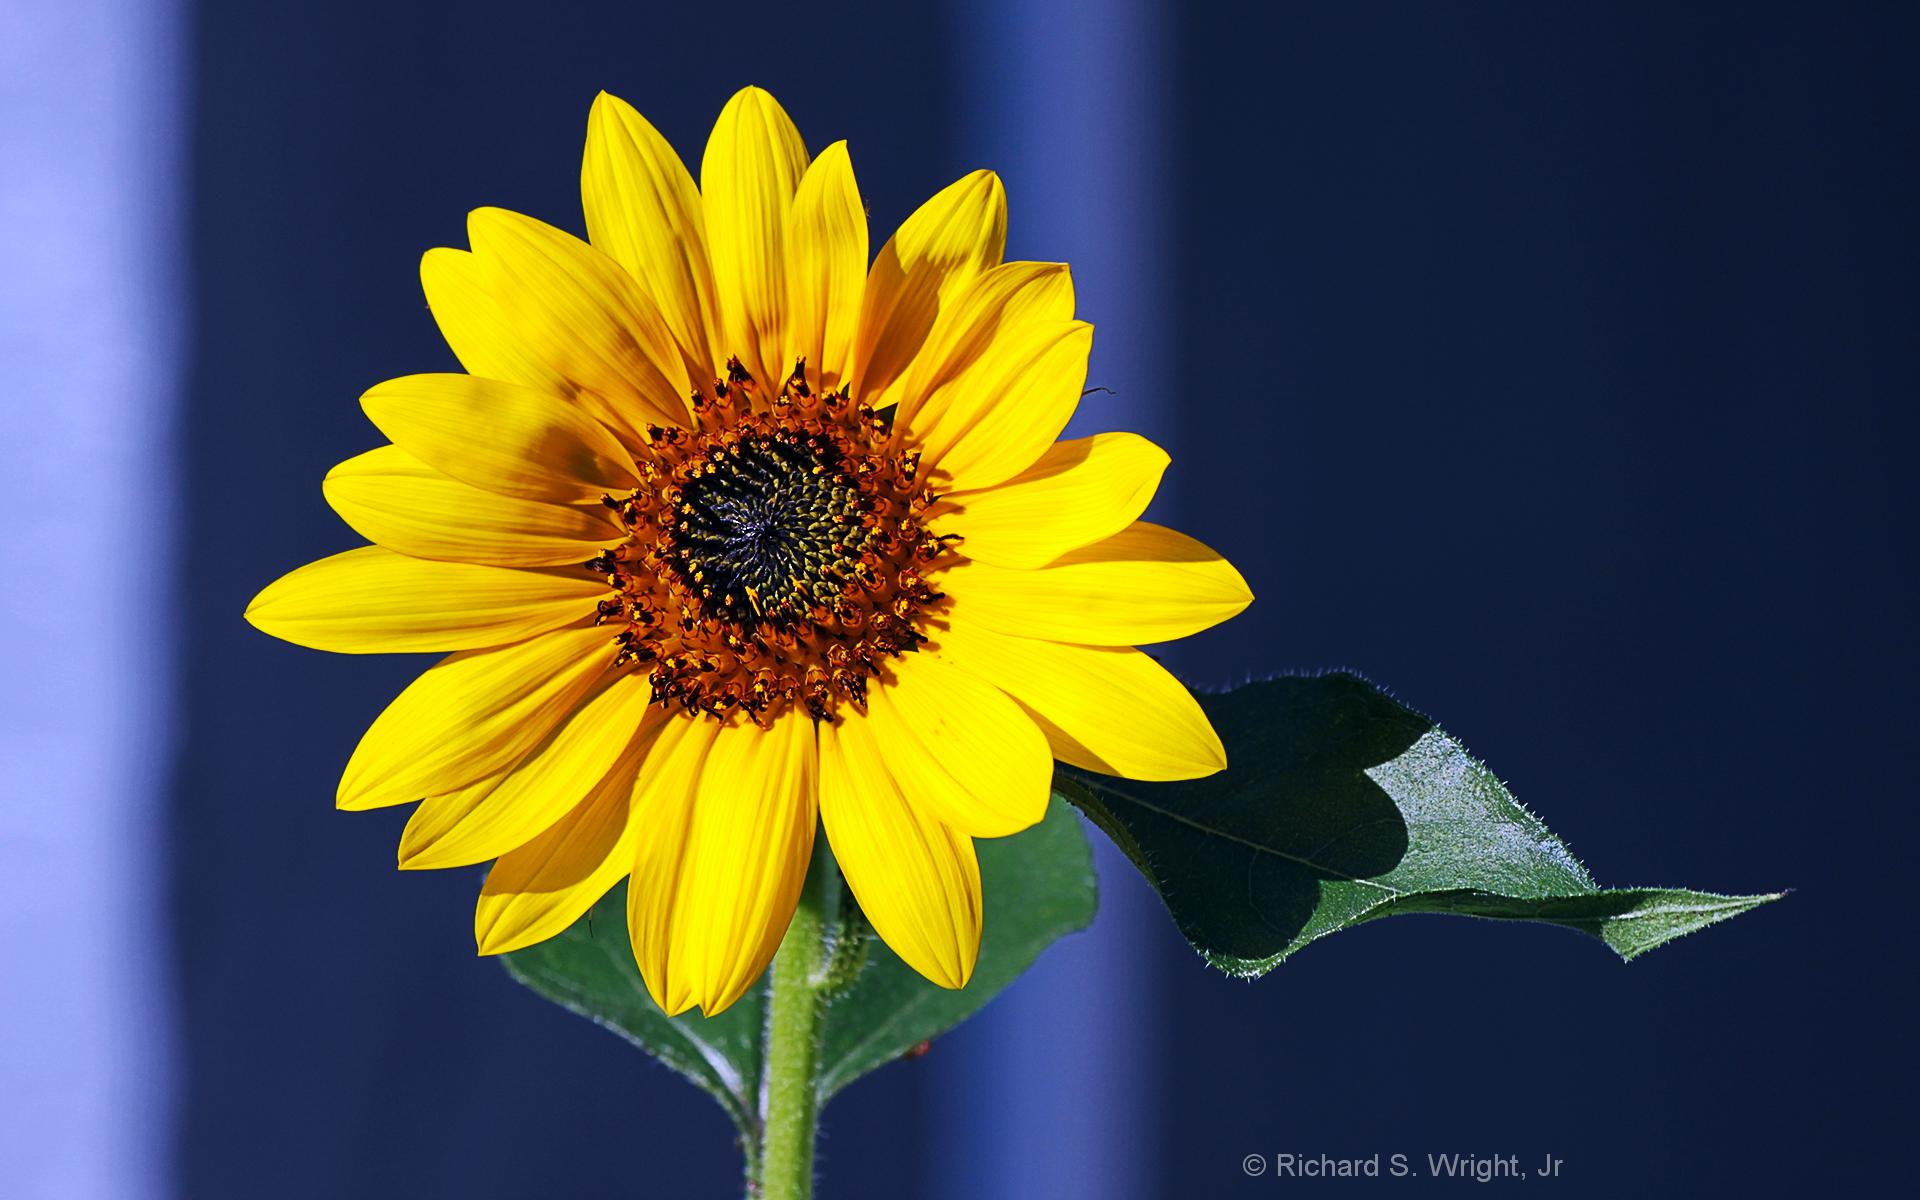 ©Sunflower by Photographer Richard S. Wright, Jr. Photography World. www.photographyworld.org